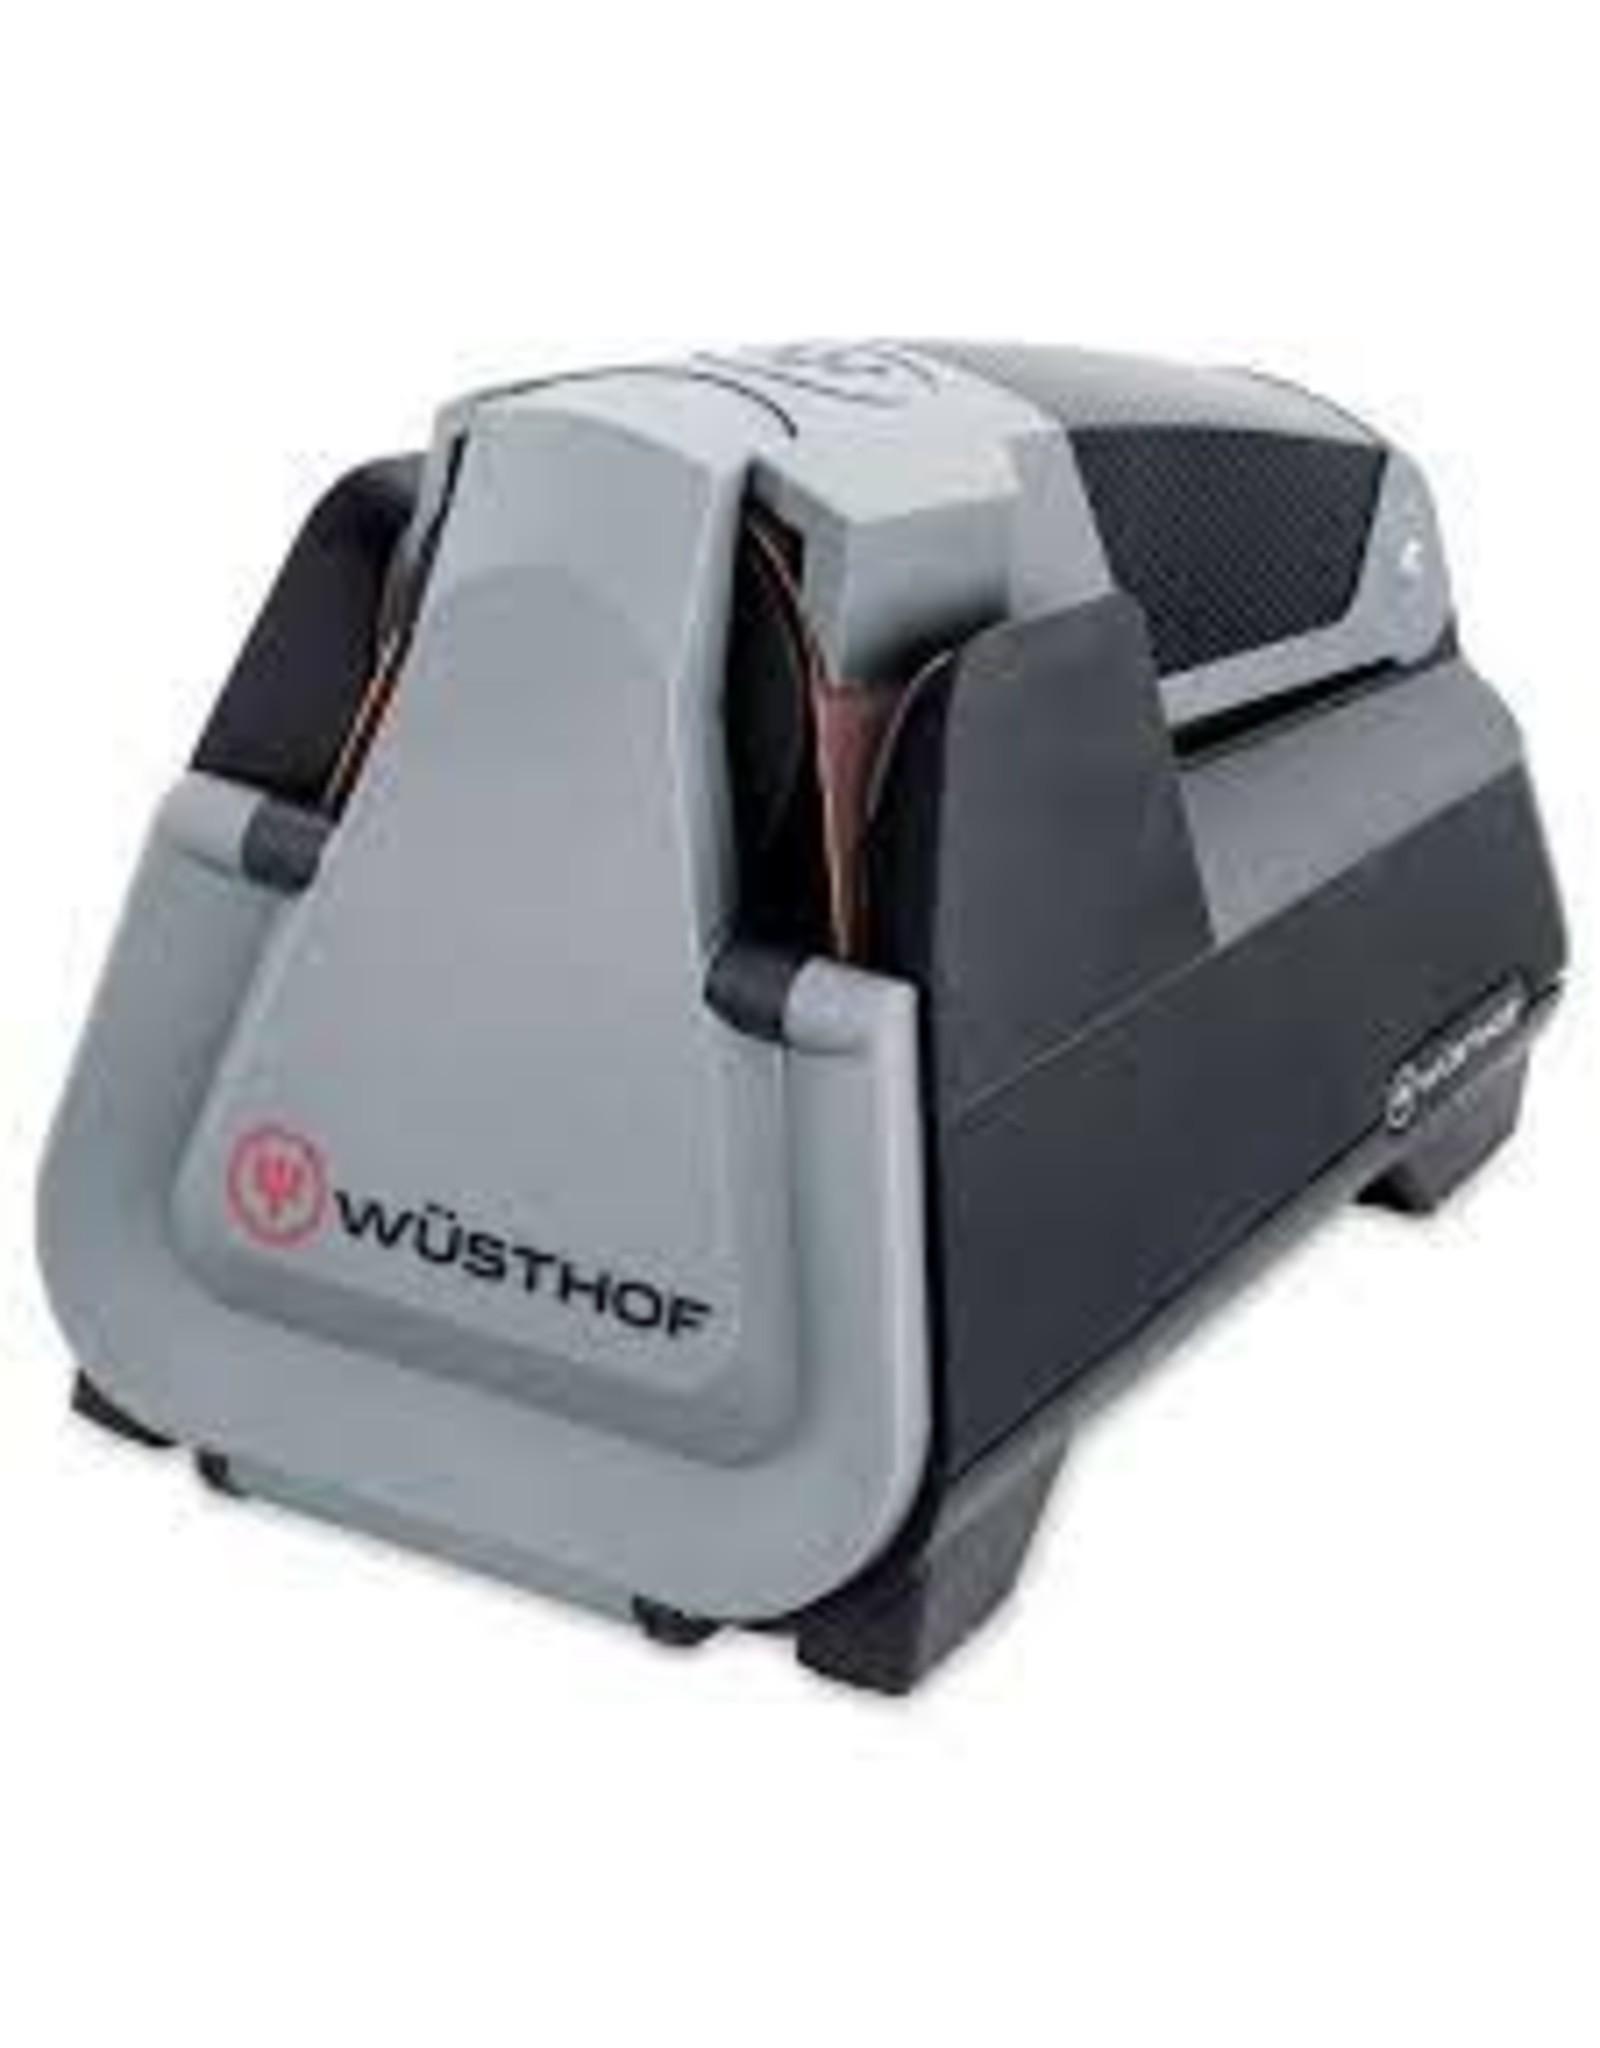 Wusthoff WUSTHOF Easy Edge Electric Knife Sharpener